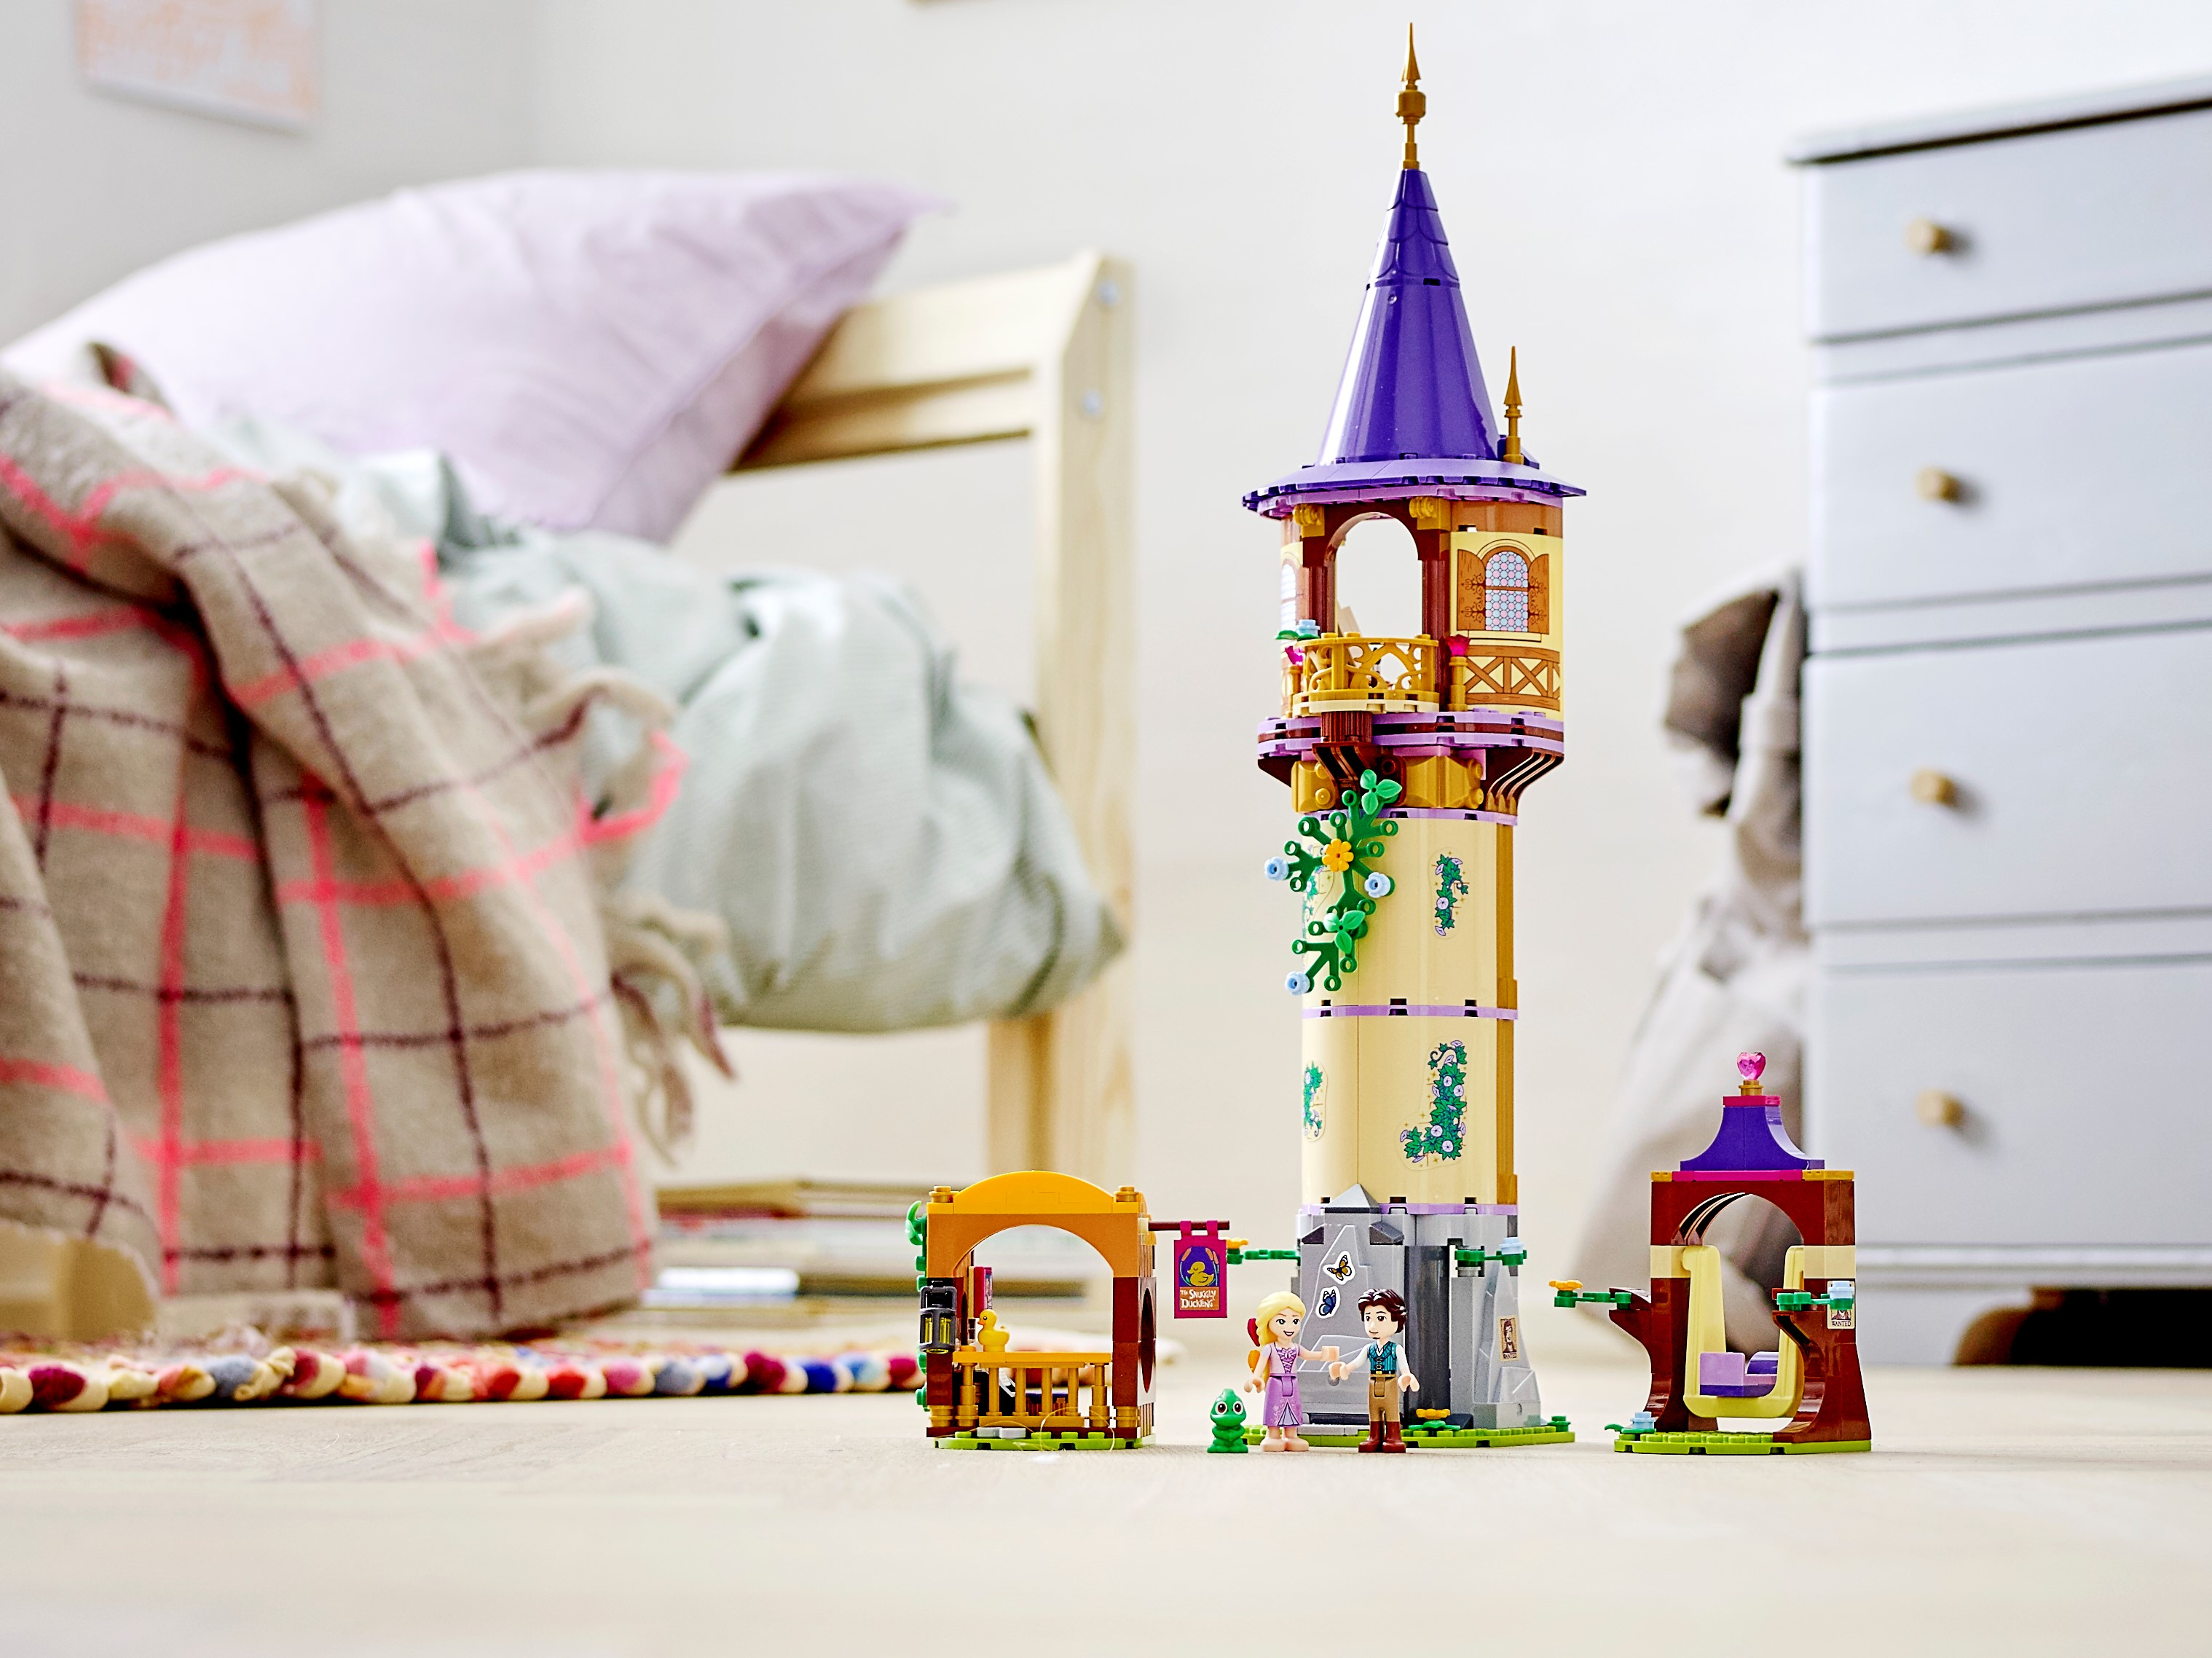 43187 for sale online LEGO Rapunzel/'s Tower Disney Princess